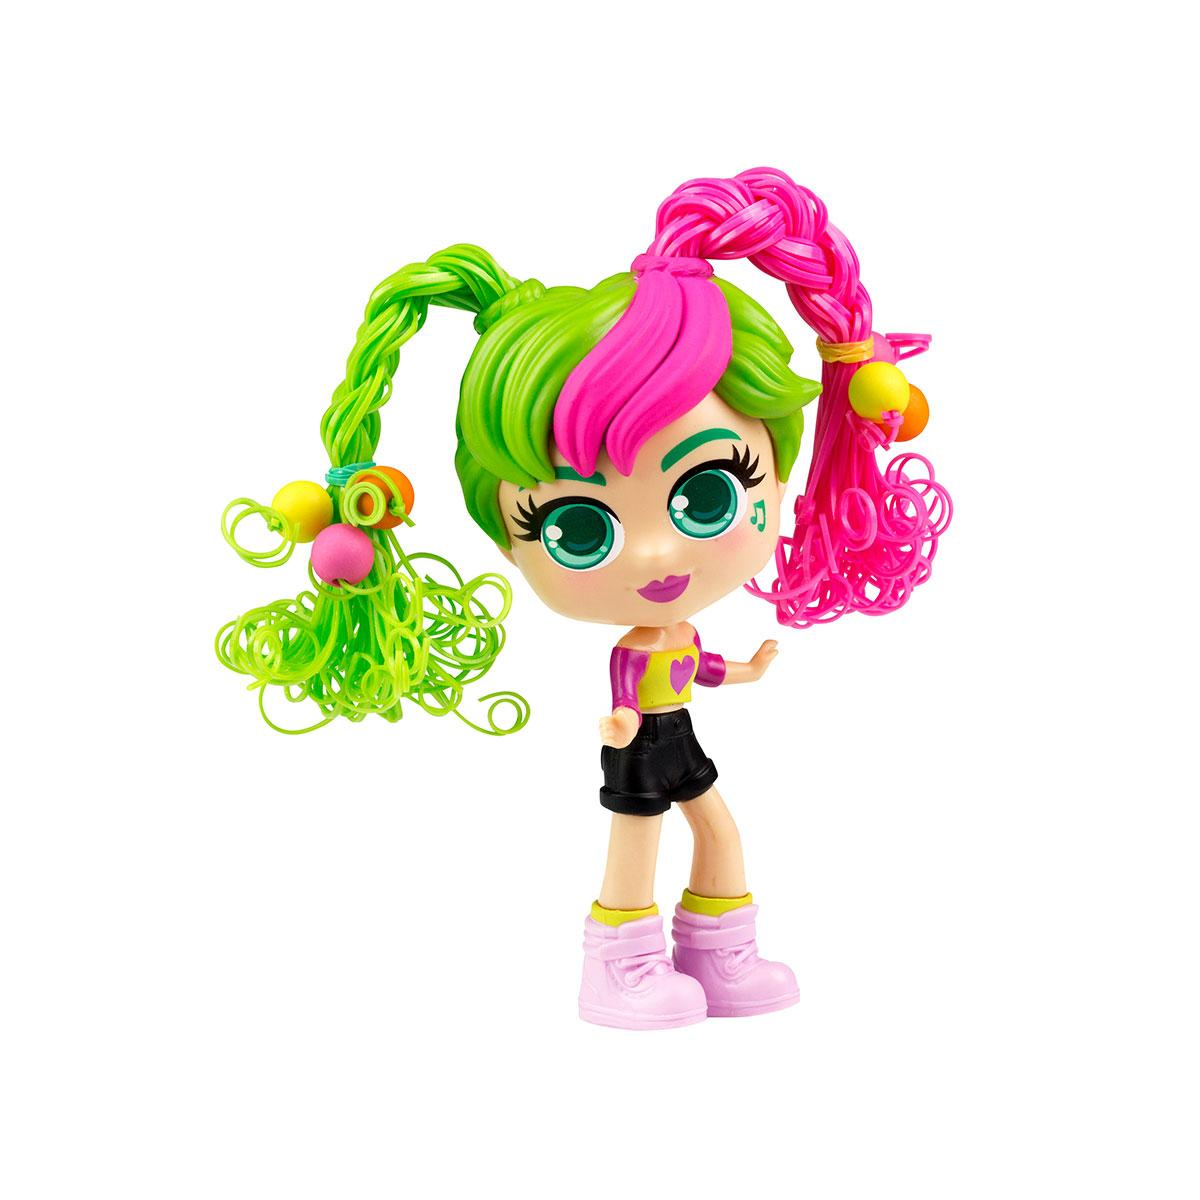 Кукла Curligirls - Вечеринка Келли Silverlit Toys CurliGirls Kelli Dance Party - Hairstyling Doll